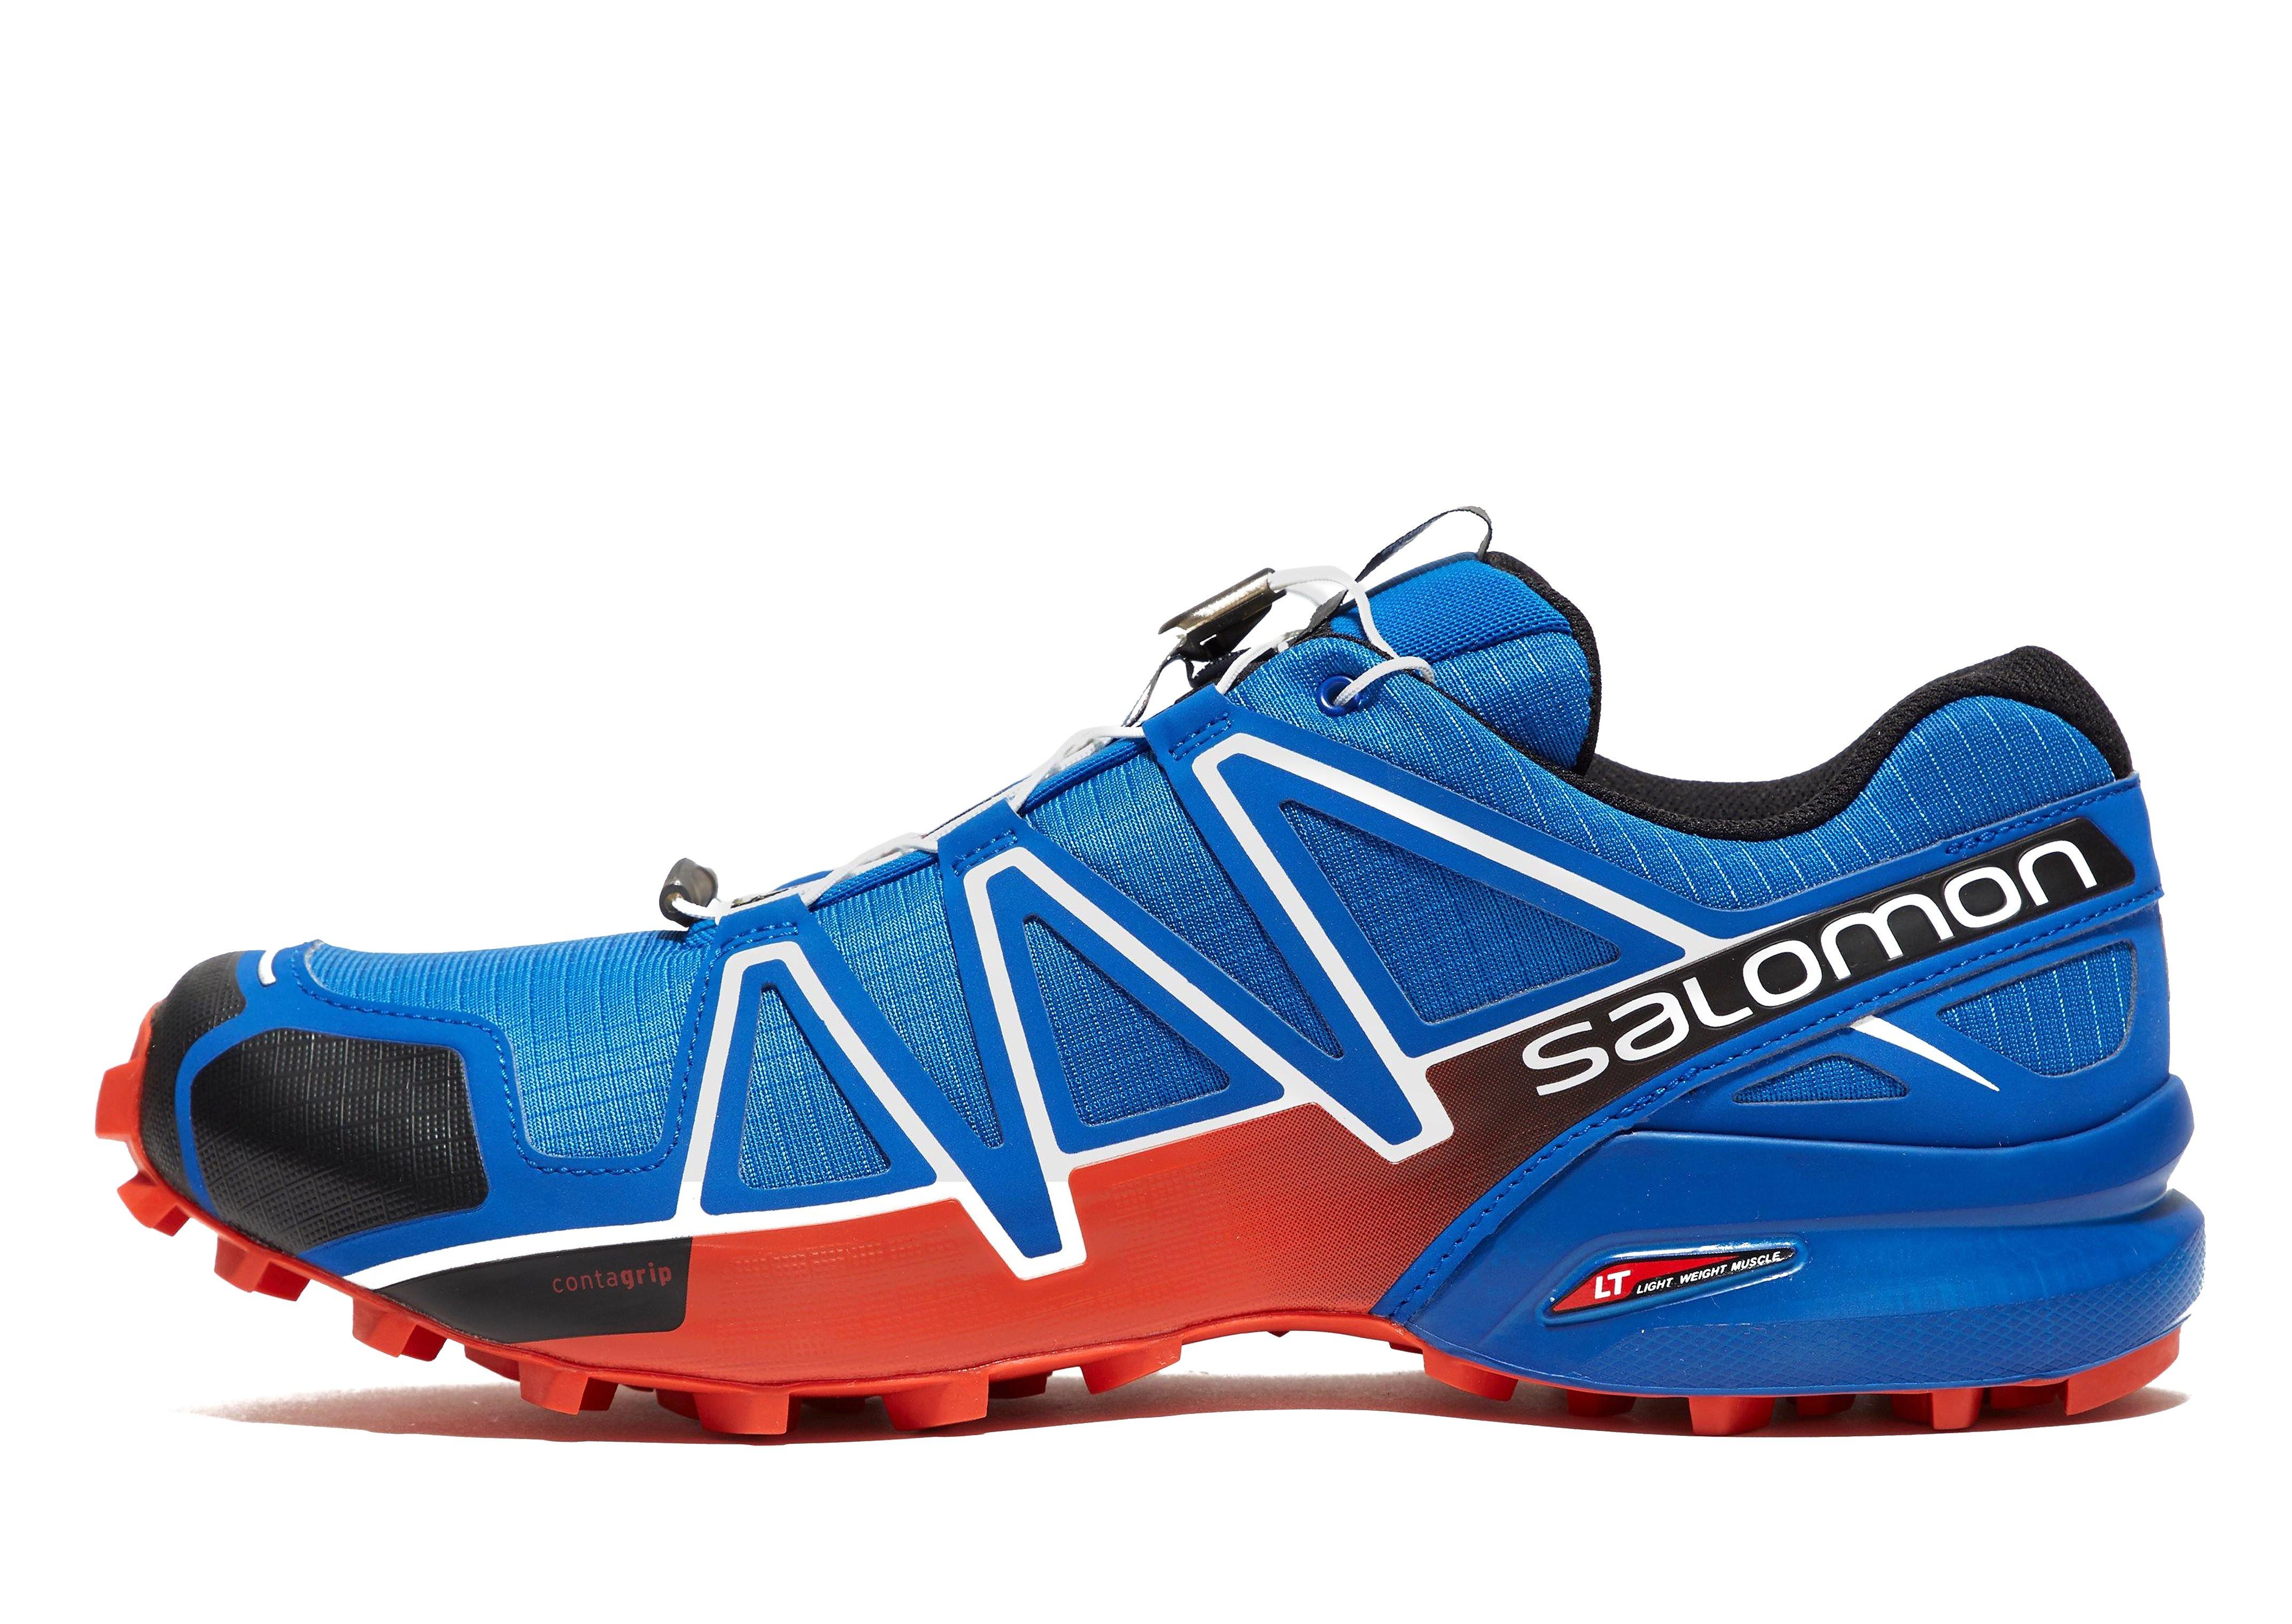 Salomon Speedcross 4 Trail Running Shoes